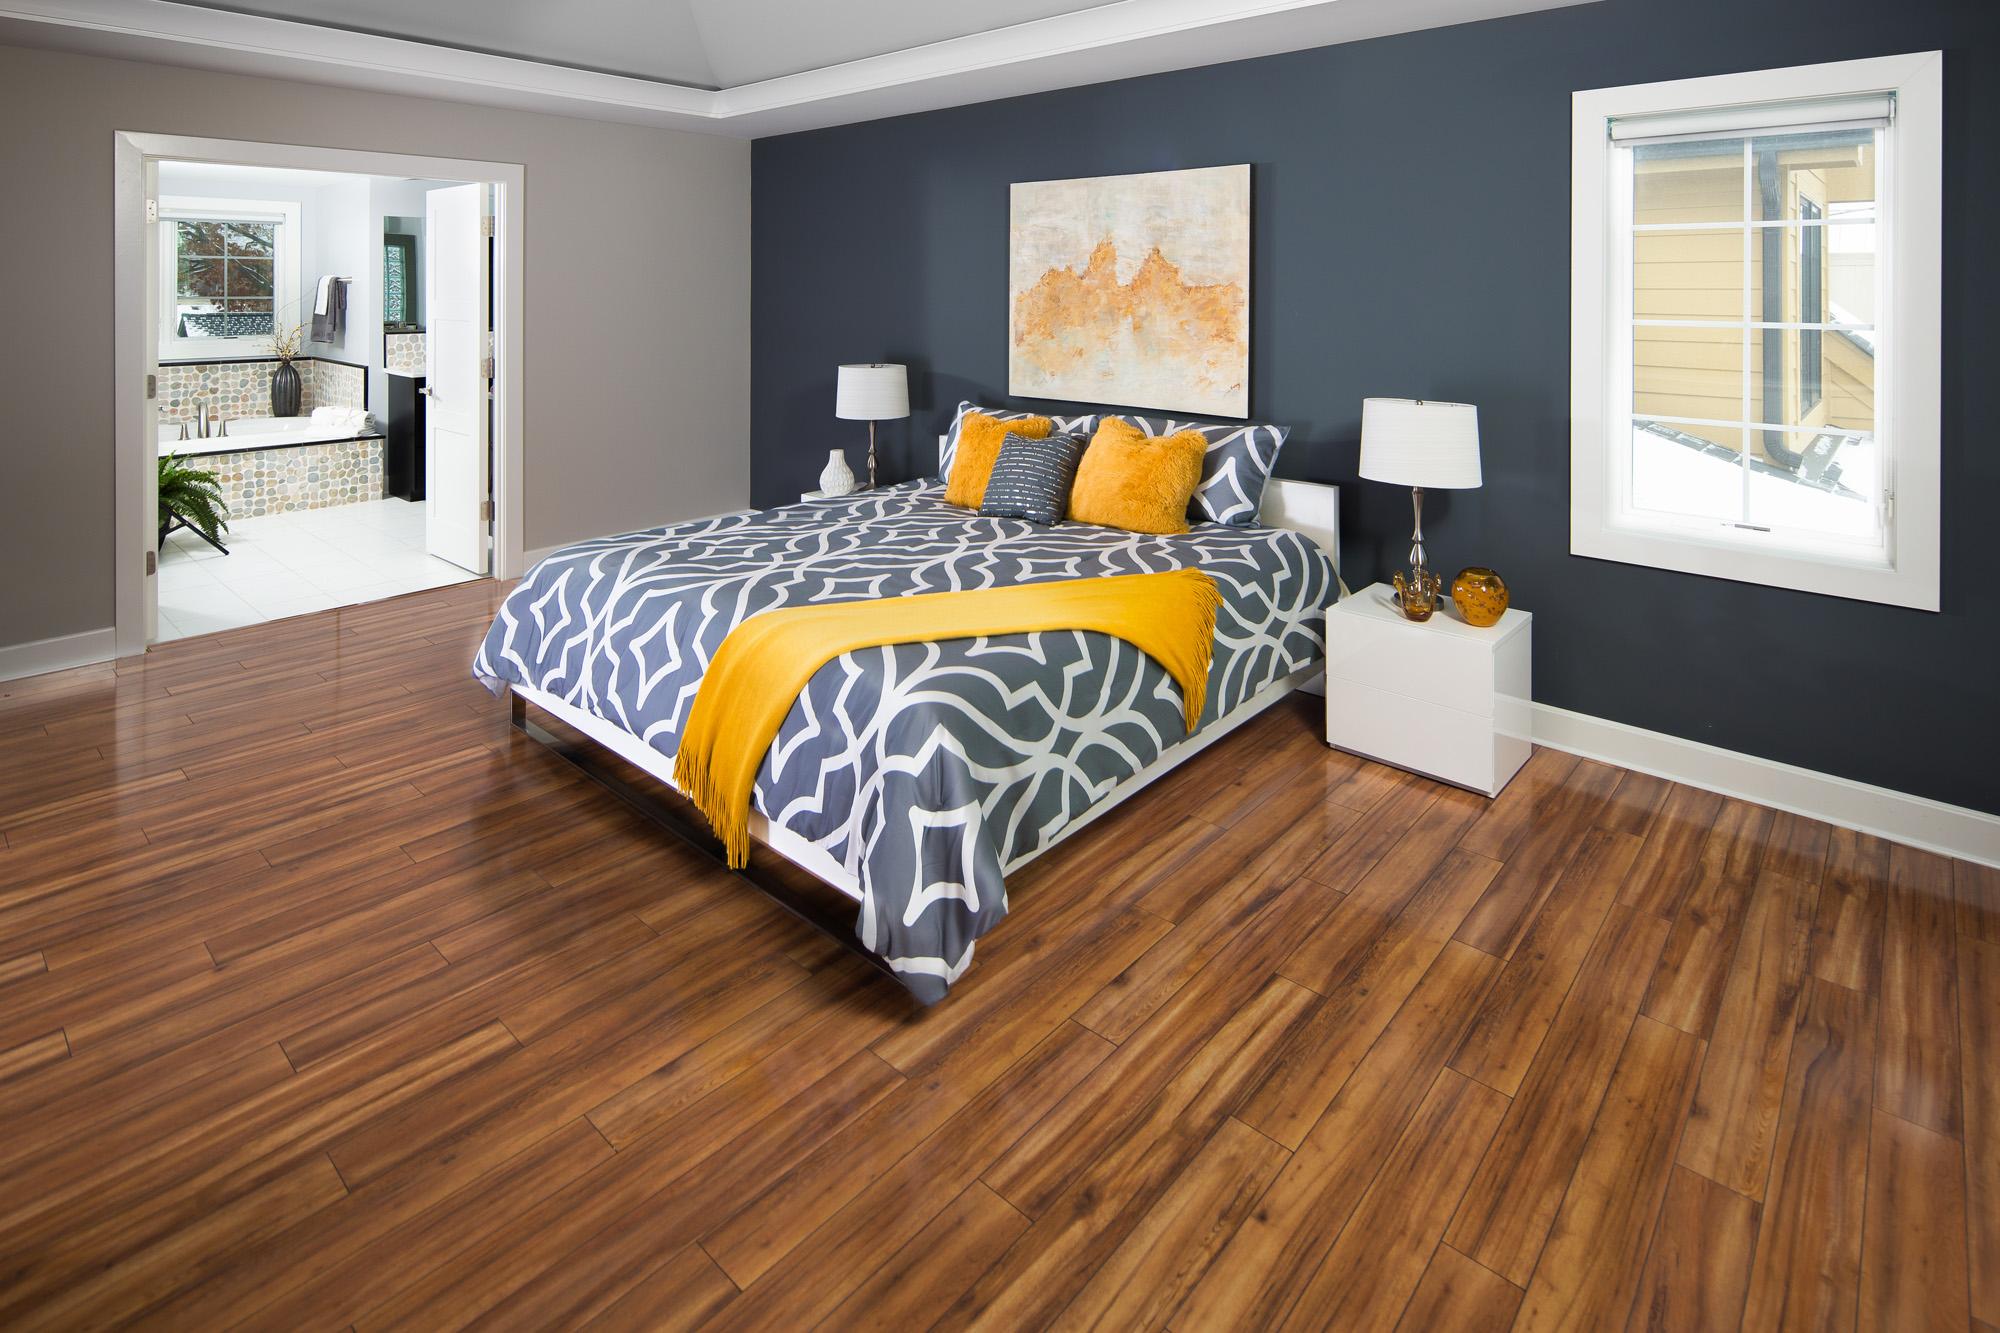 clarion-park-view-caramel-bedroom.jpg